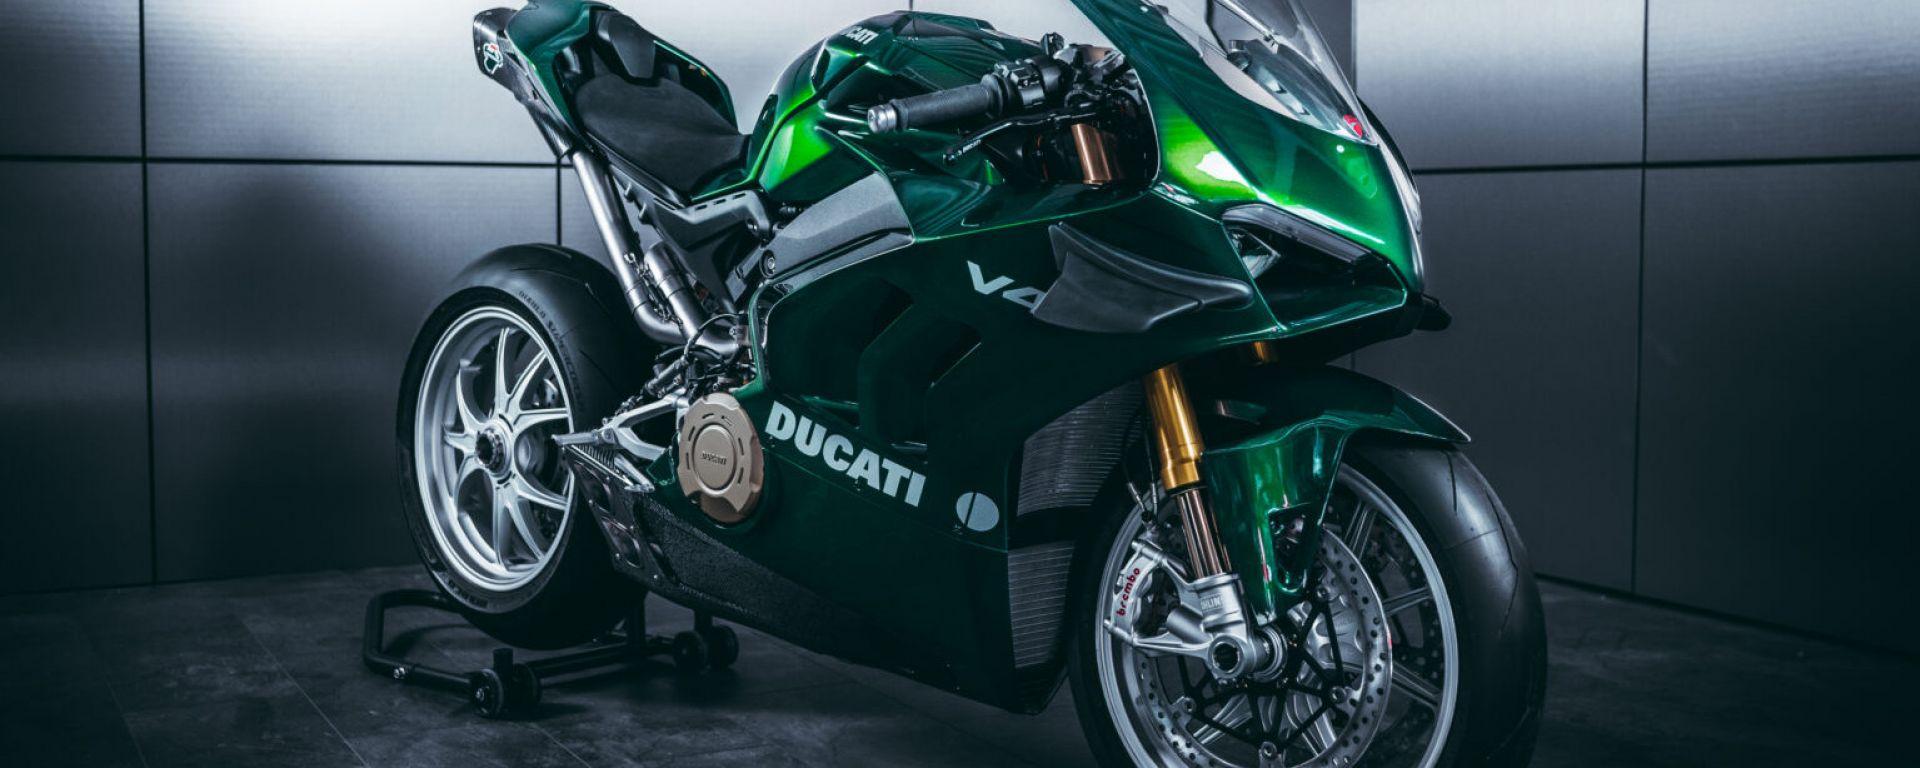 Ducati Panigale V4 Matrix: il kit prende spunto dalla 996 usata in Matrix Reloaded